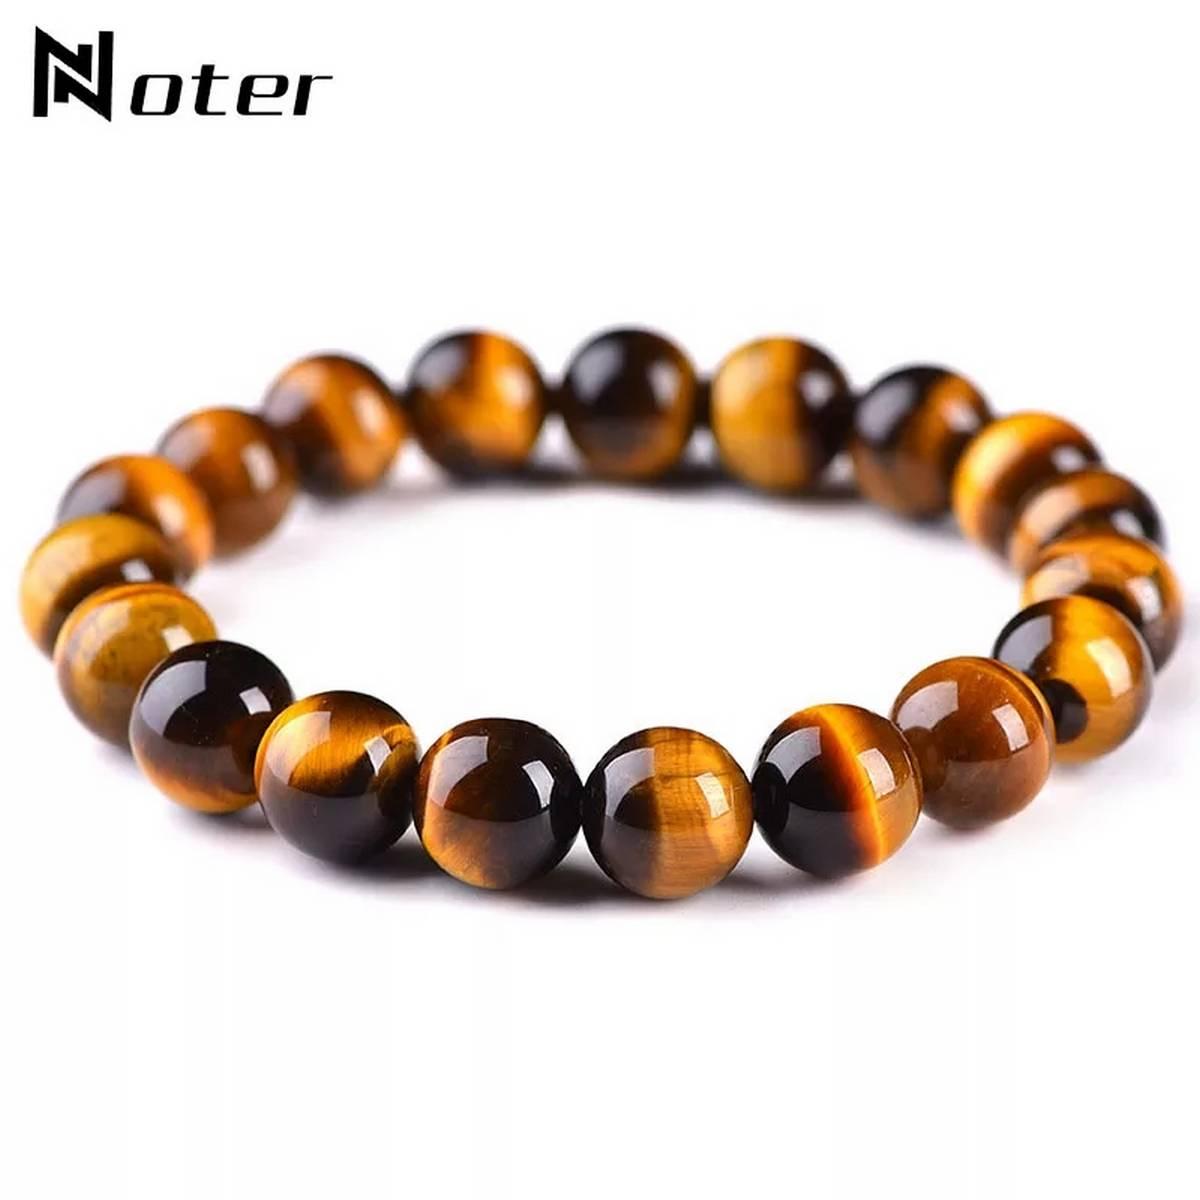 New Tiger Eye Stone Buddha Bracelet Bangle Trendy Women Men Fine Jewelry Gifts